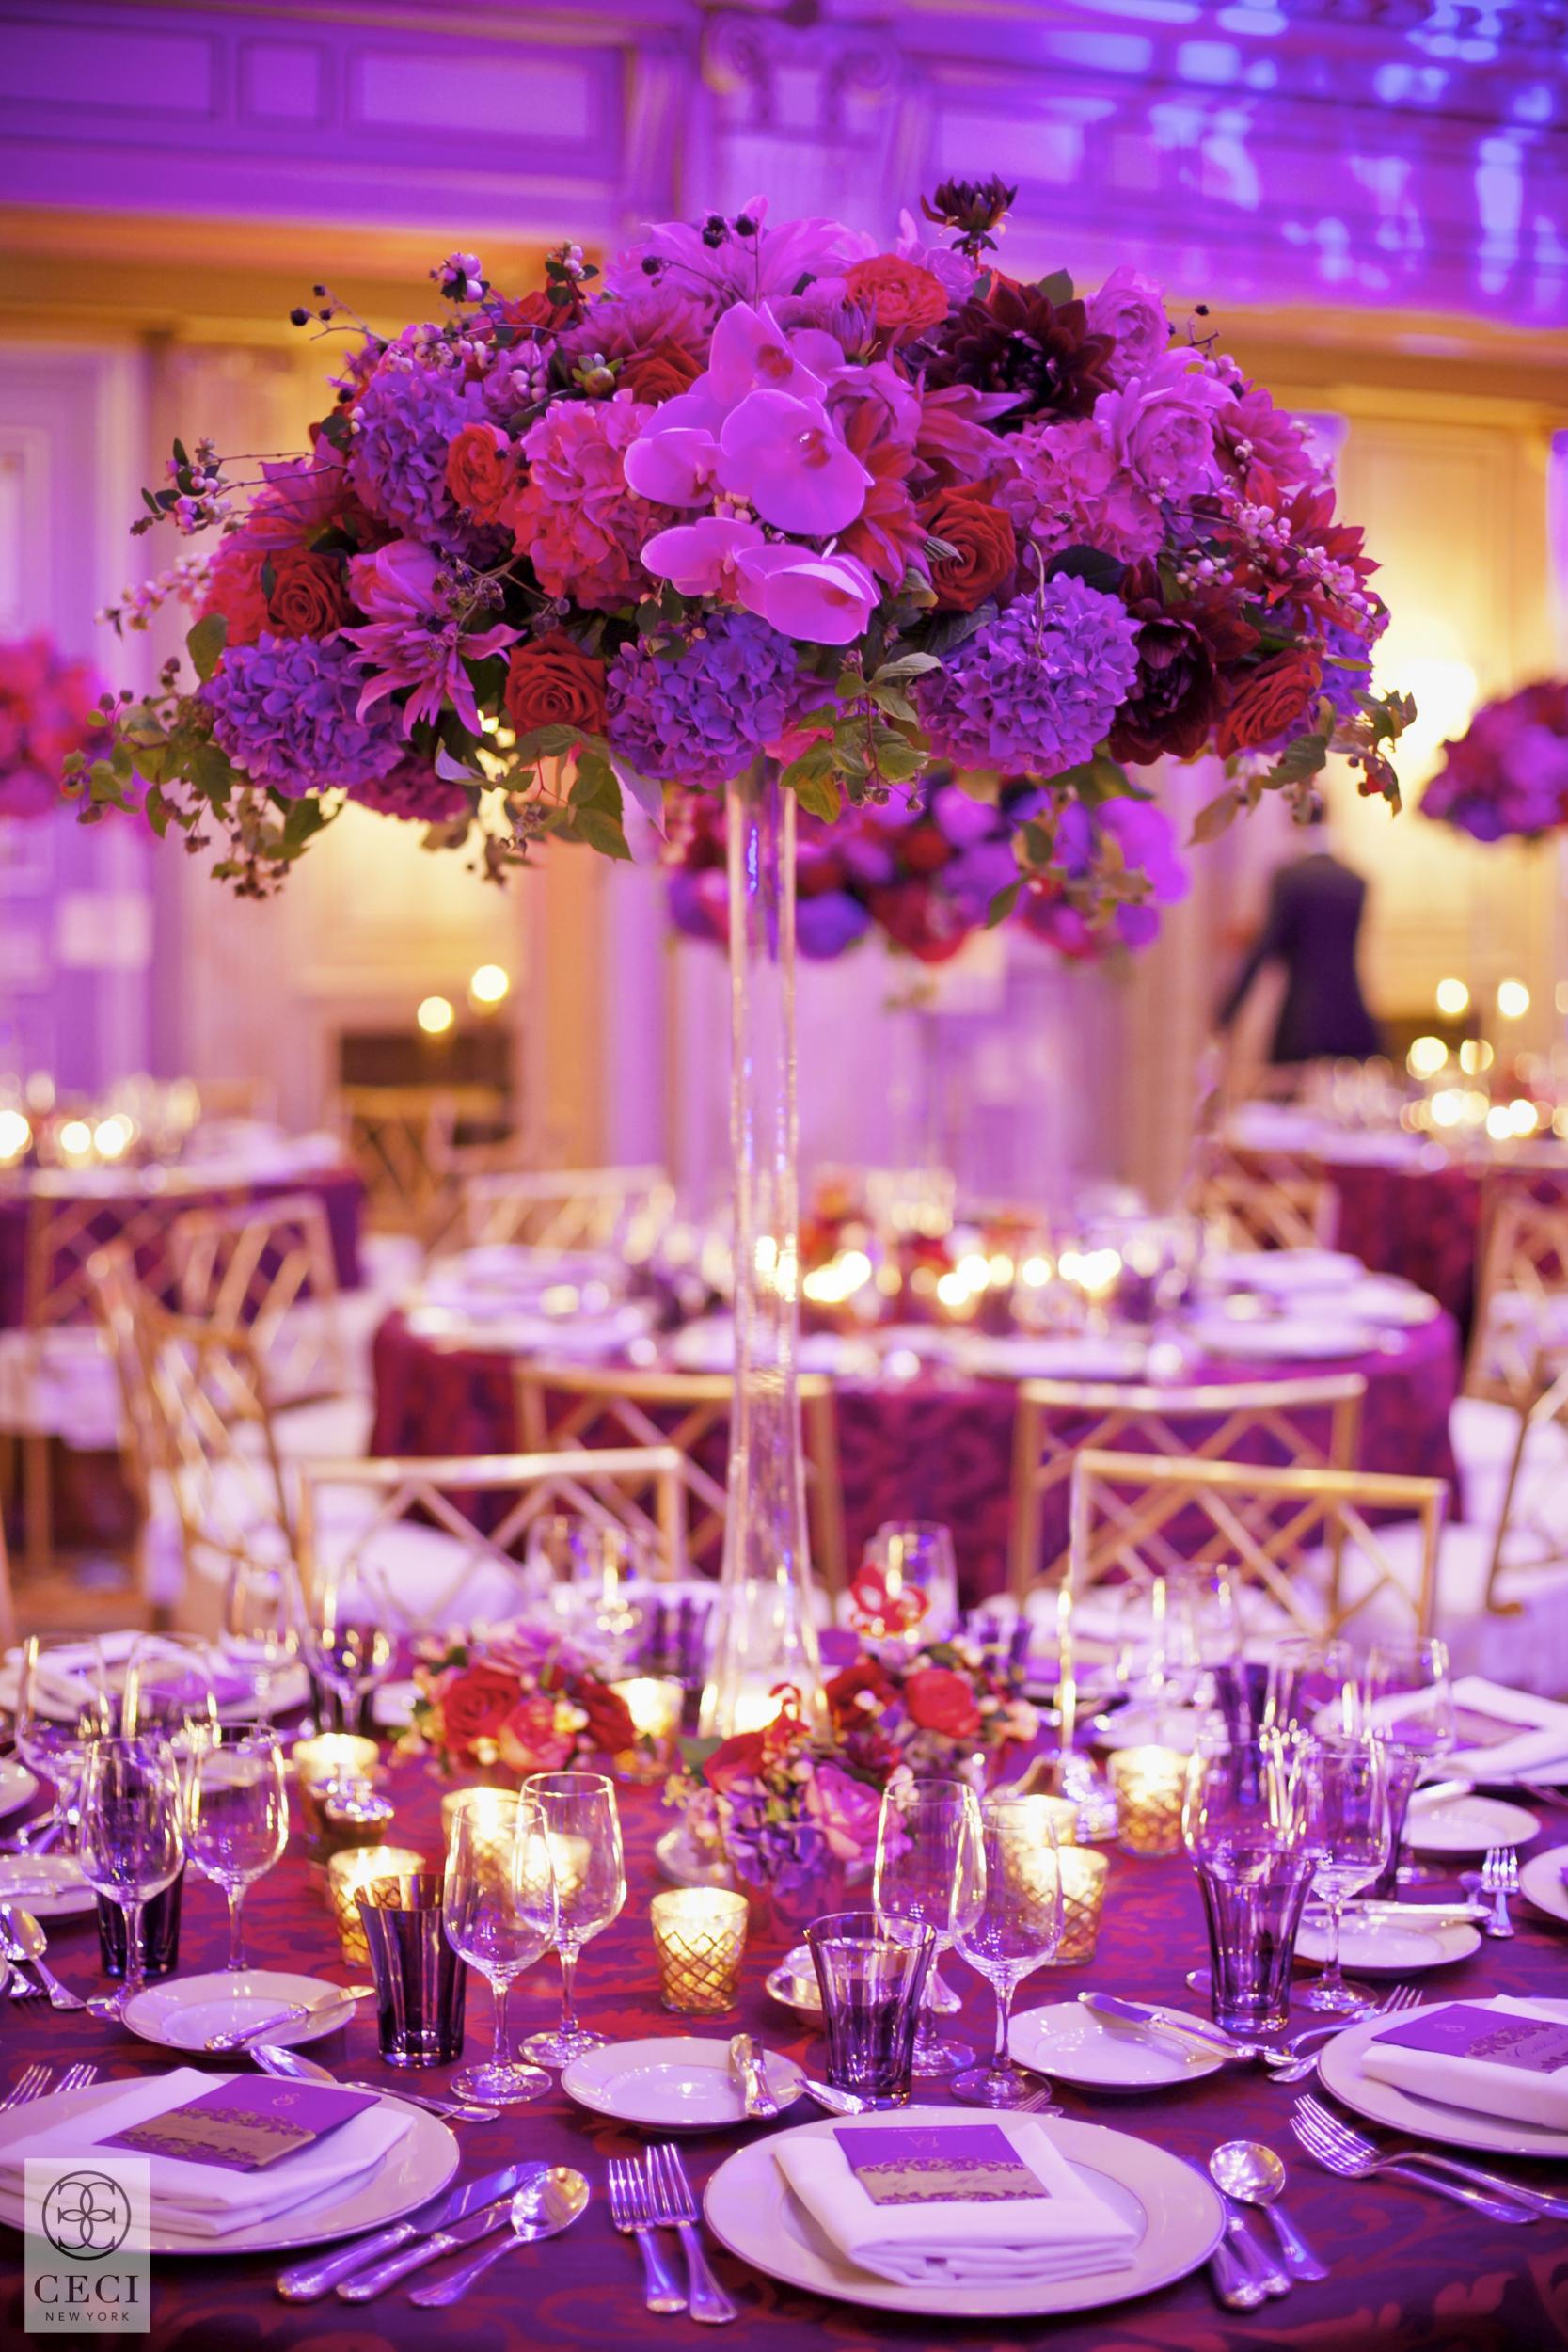 ceci_new_york_lucas_somoza_purple_regal_wediding_birthday_commitment_ceremony_gold-16.jpg